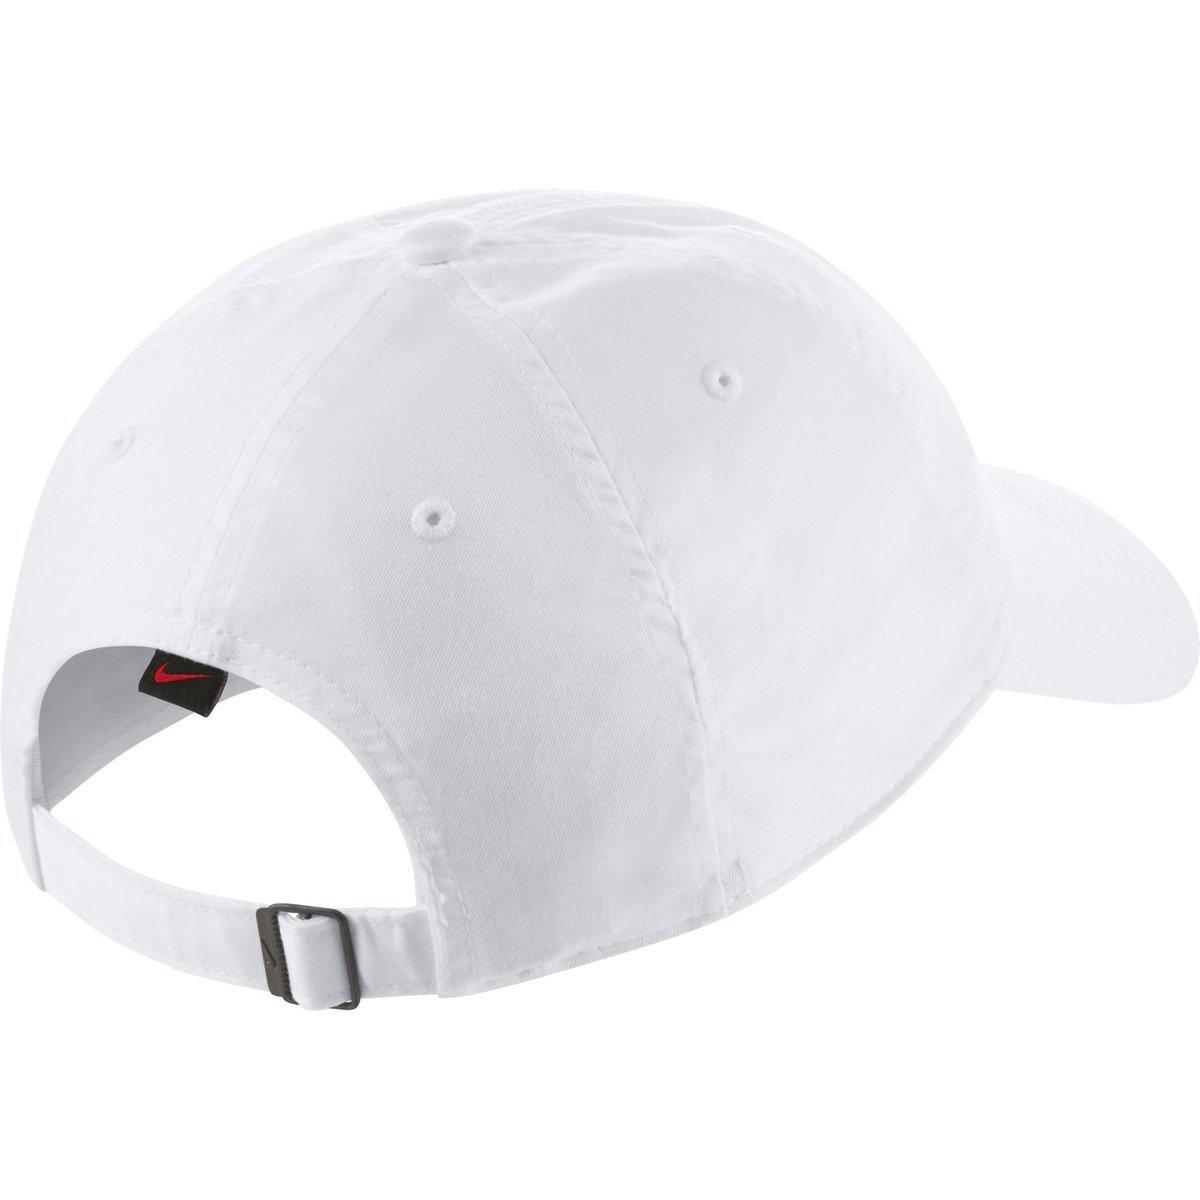 acade472012 Nike - White Heritage 86 Tennis Cap for Men - Lyst. View fullscreen